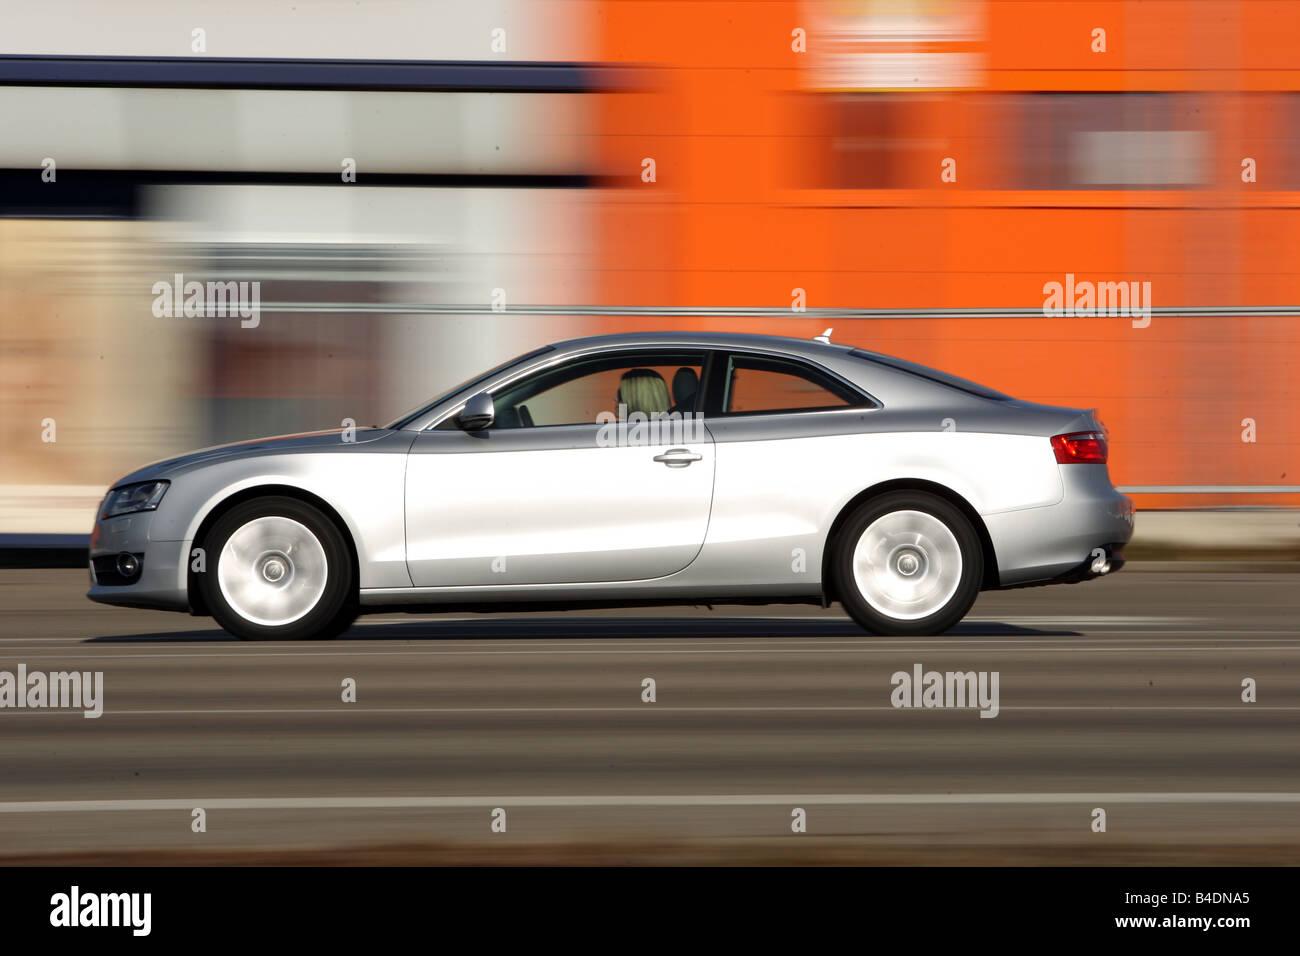 Audi A5 Side Immagini Audi A5 Side Fotos Stock Alamy